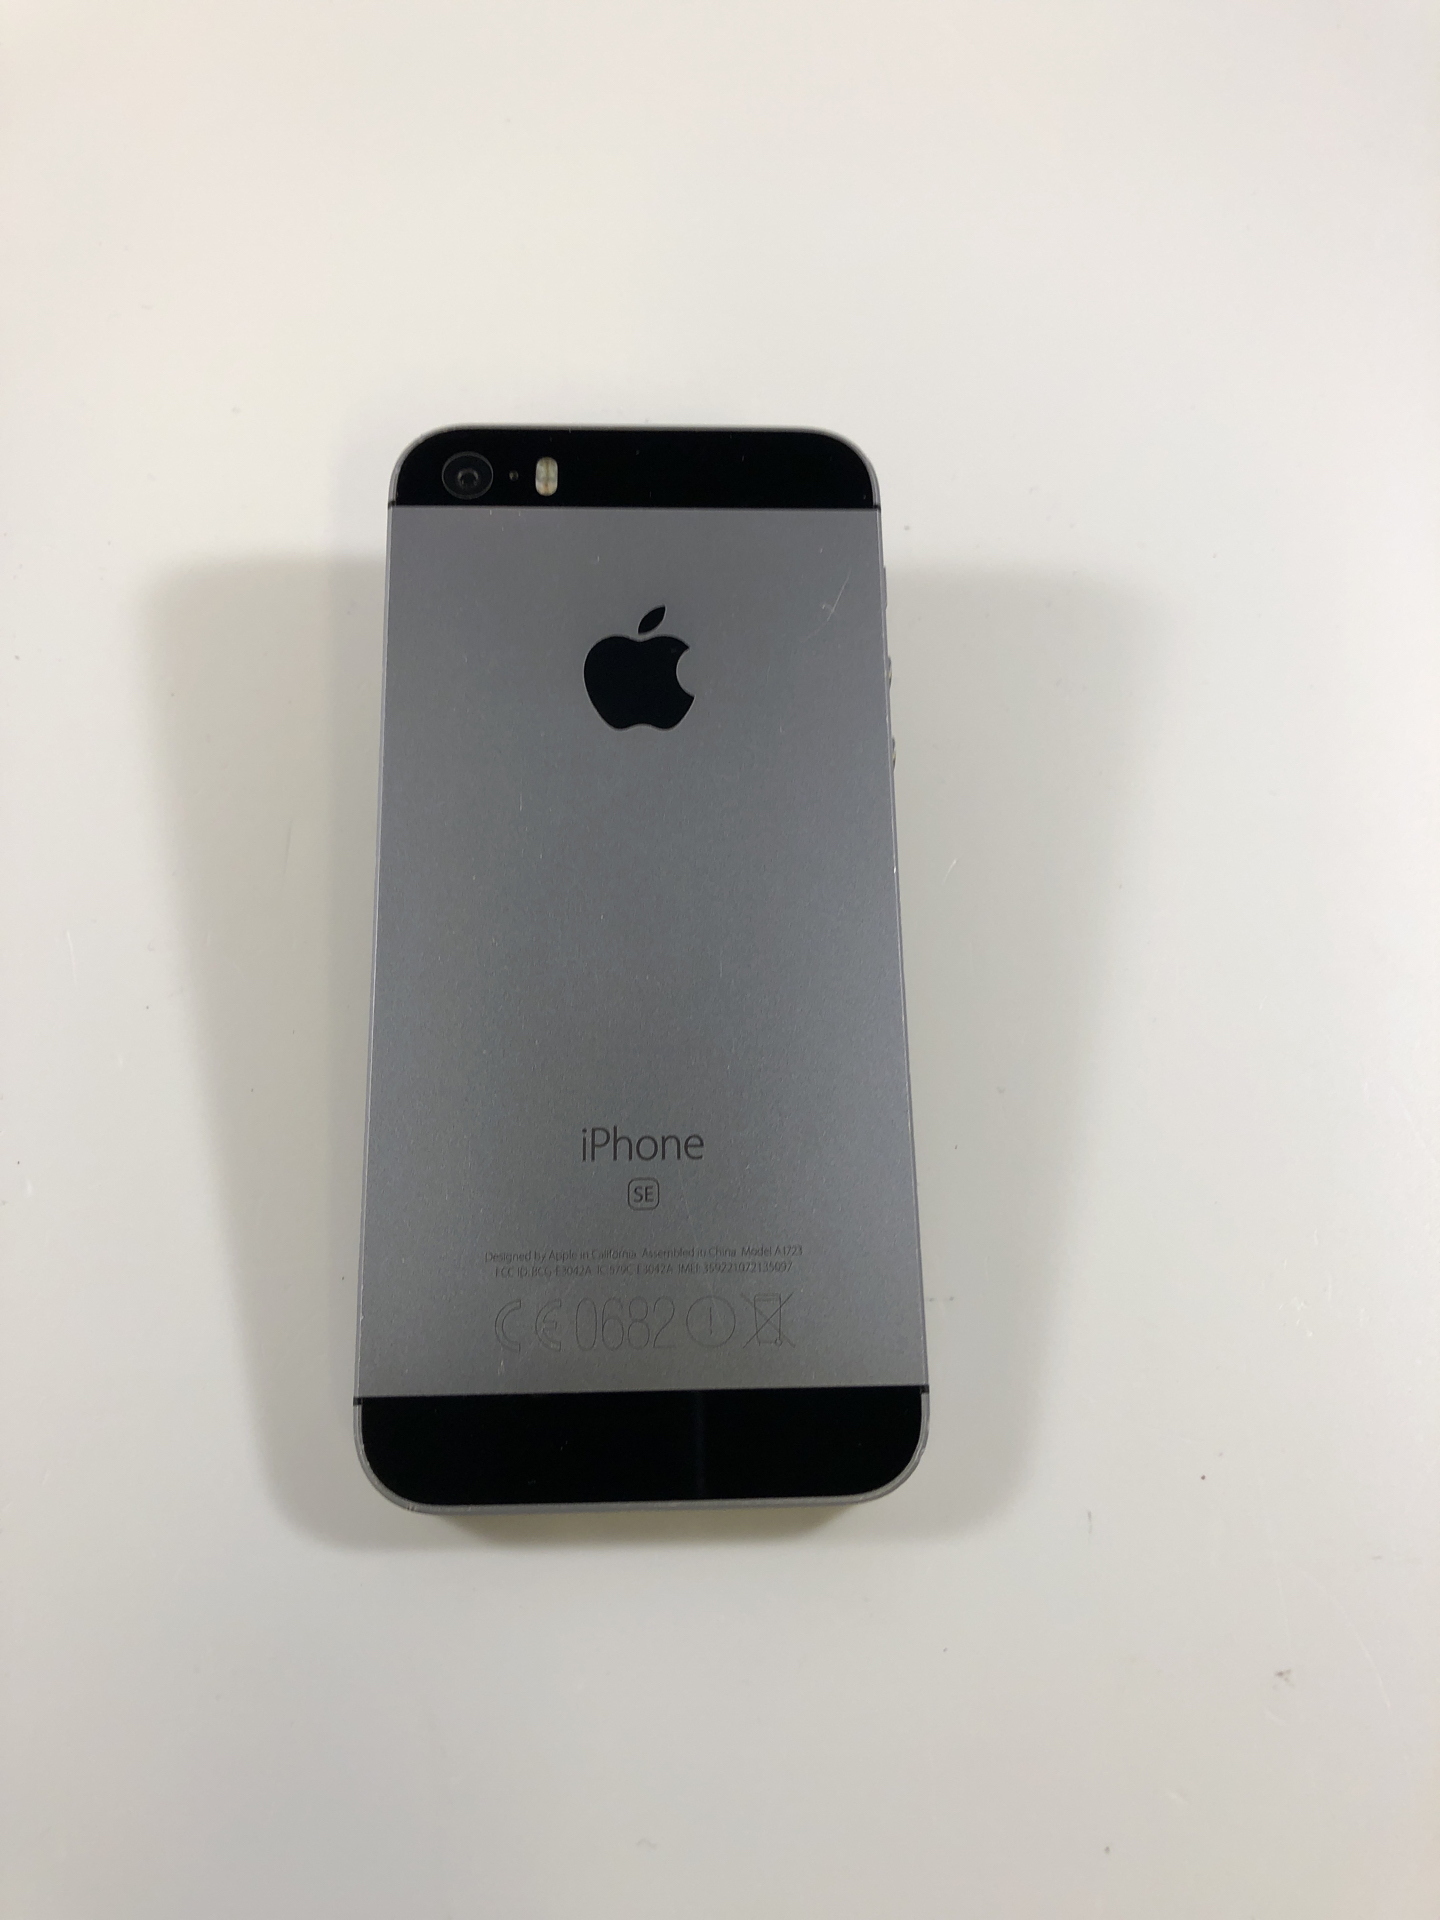 iPhone SE 16GB, 16GB, Space Gray, bild 2